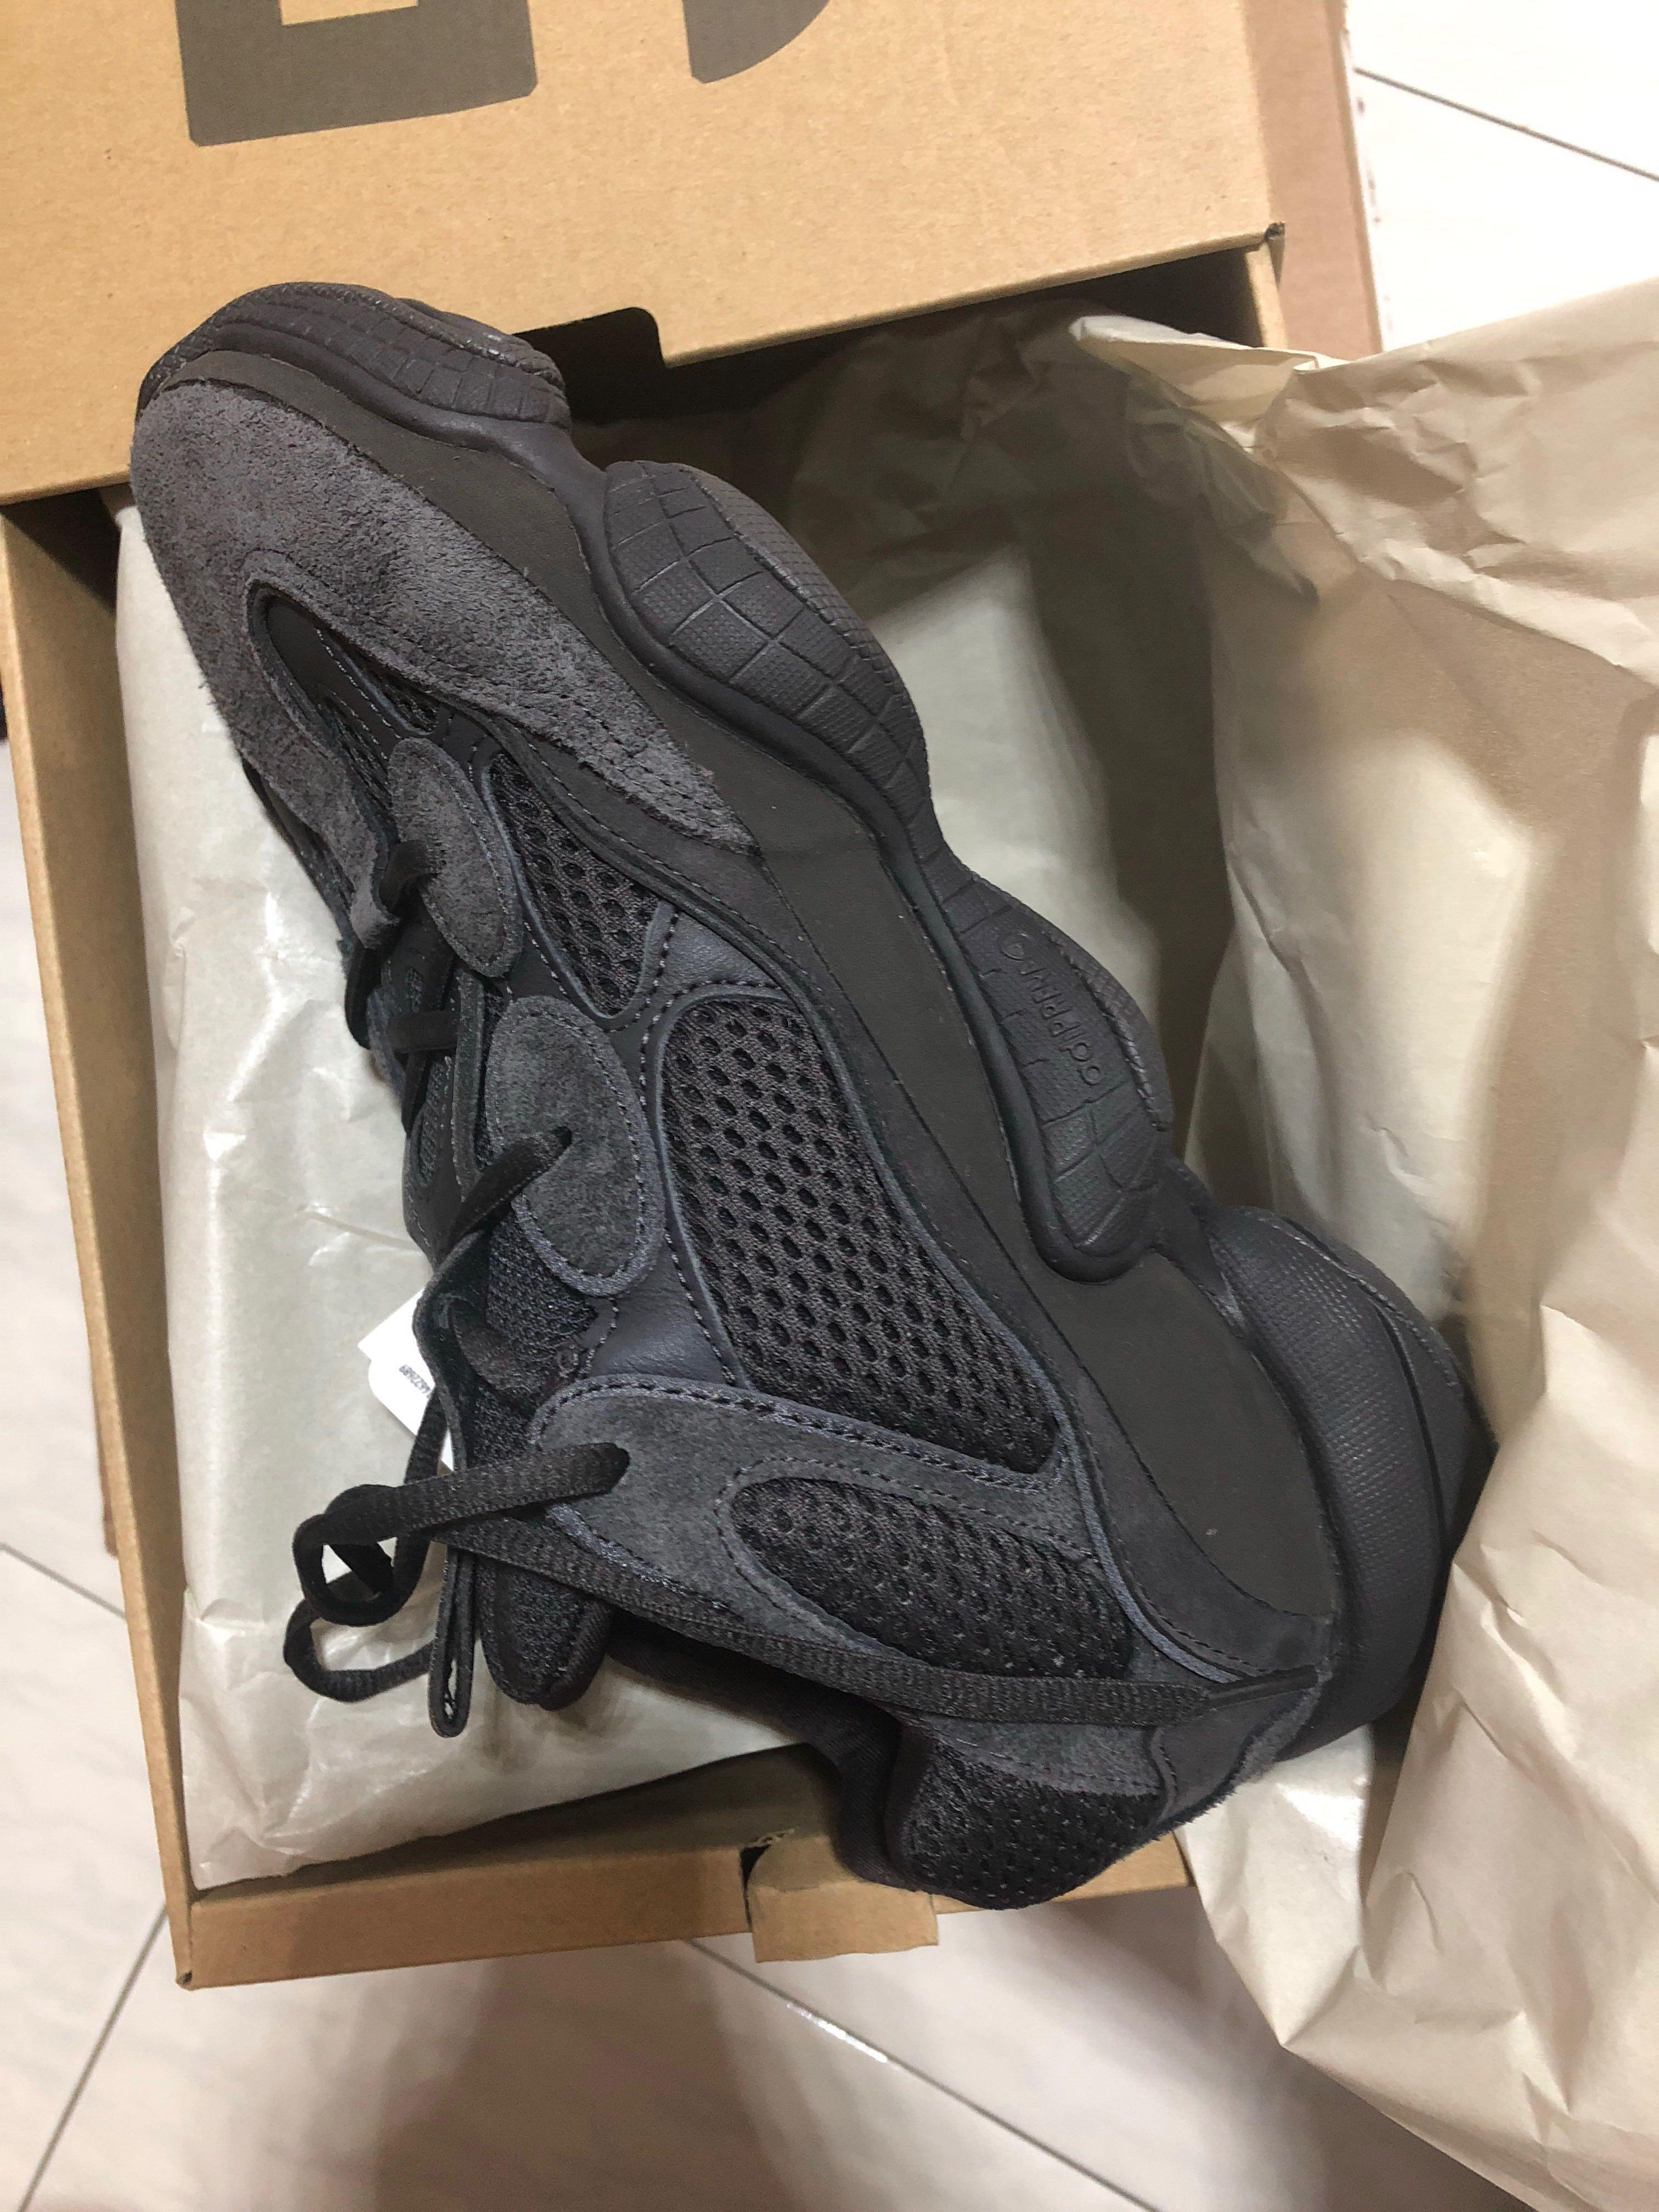 online retailer 0522c 8b903 adidas Originals x Kanye West Yeezy 500 F36640 Utility Black ...